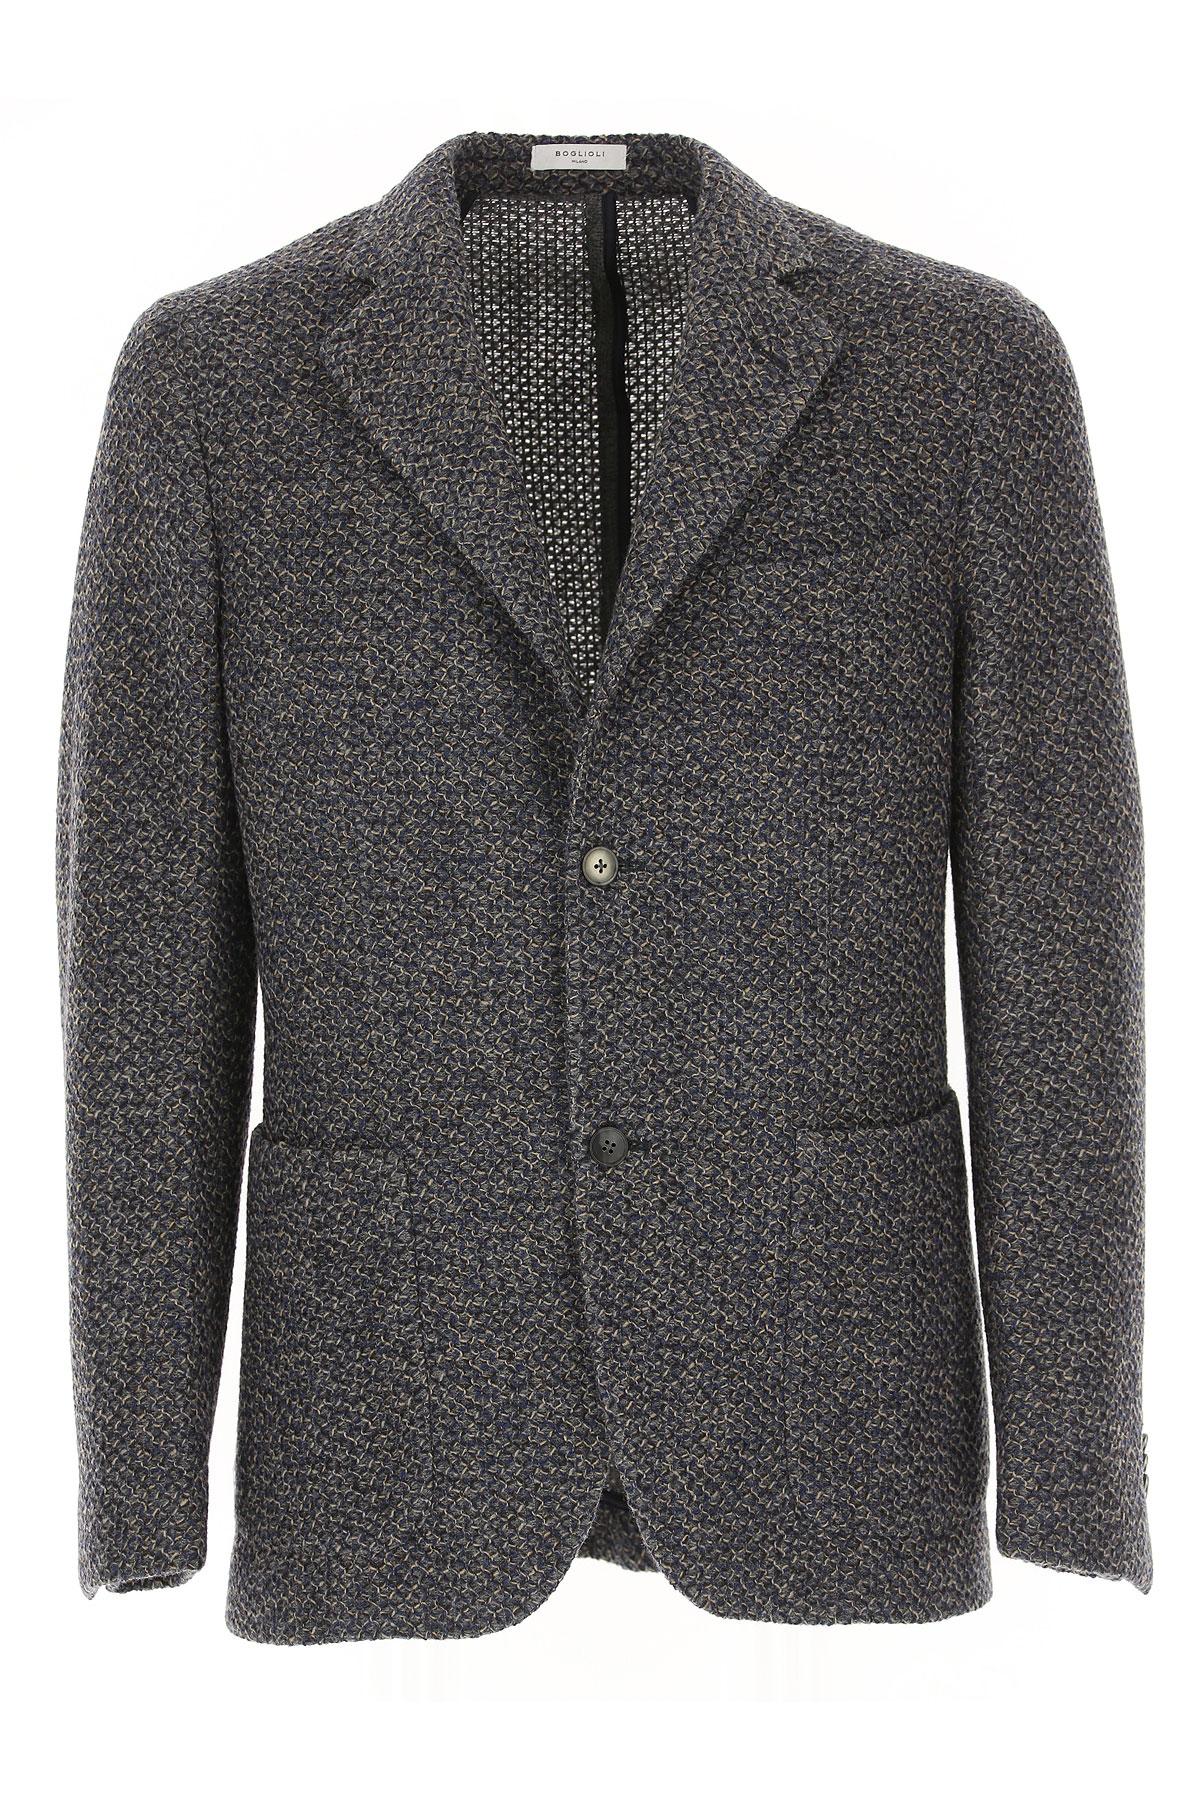 Image of Boglioli Blazer for Men, Sport Coat, Grey, Wool, 2017, M XL XXL